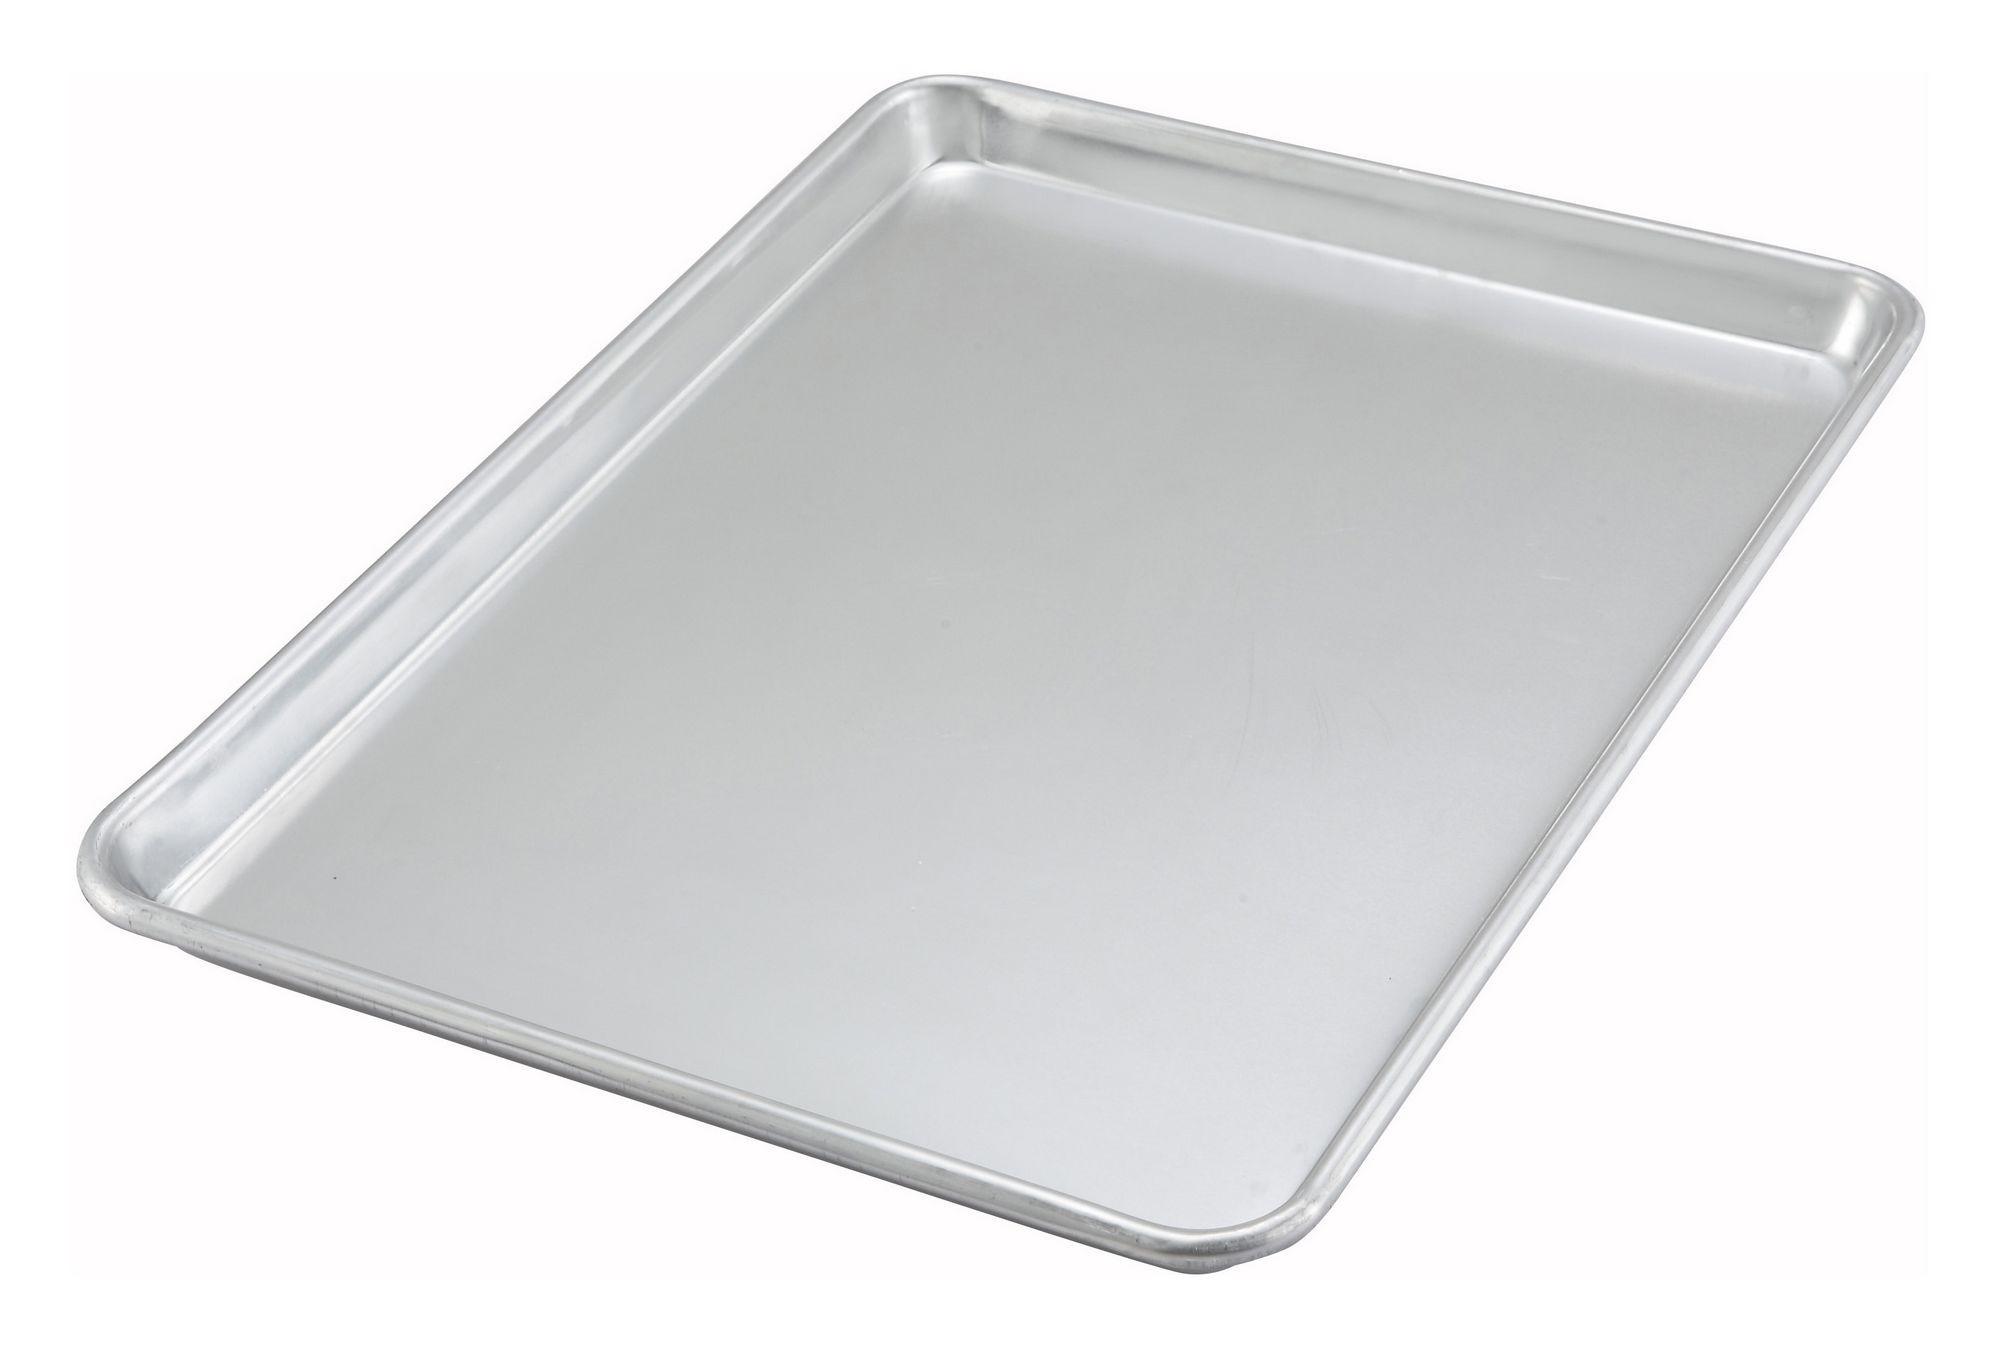 "Winco ALXP-1318 Half-Size Aluminum Sheet Pan, 13"" x 18"""